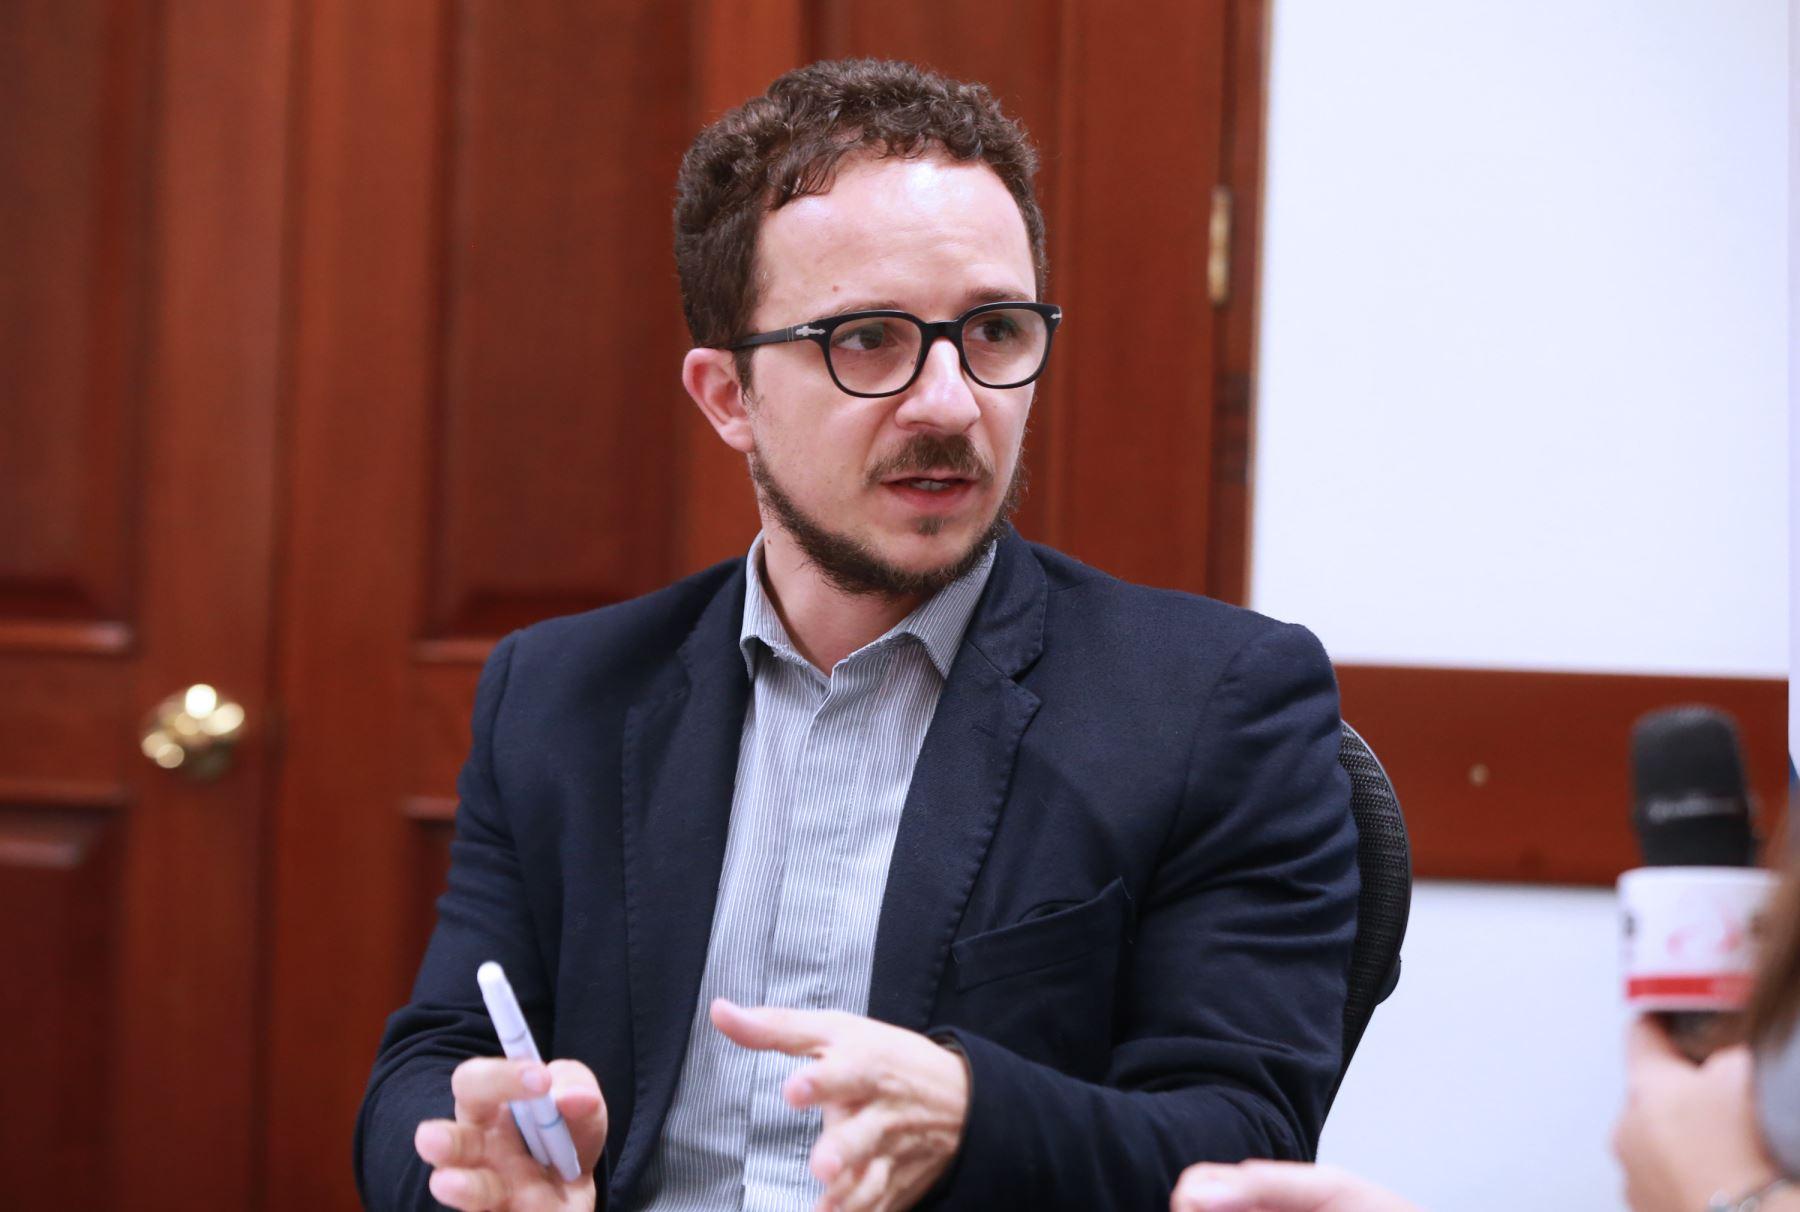 Foto: ANDINA/Norman Córdova